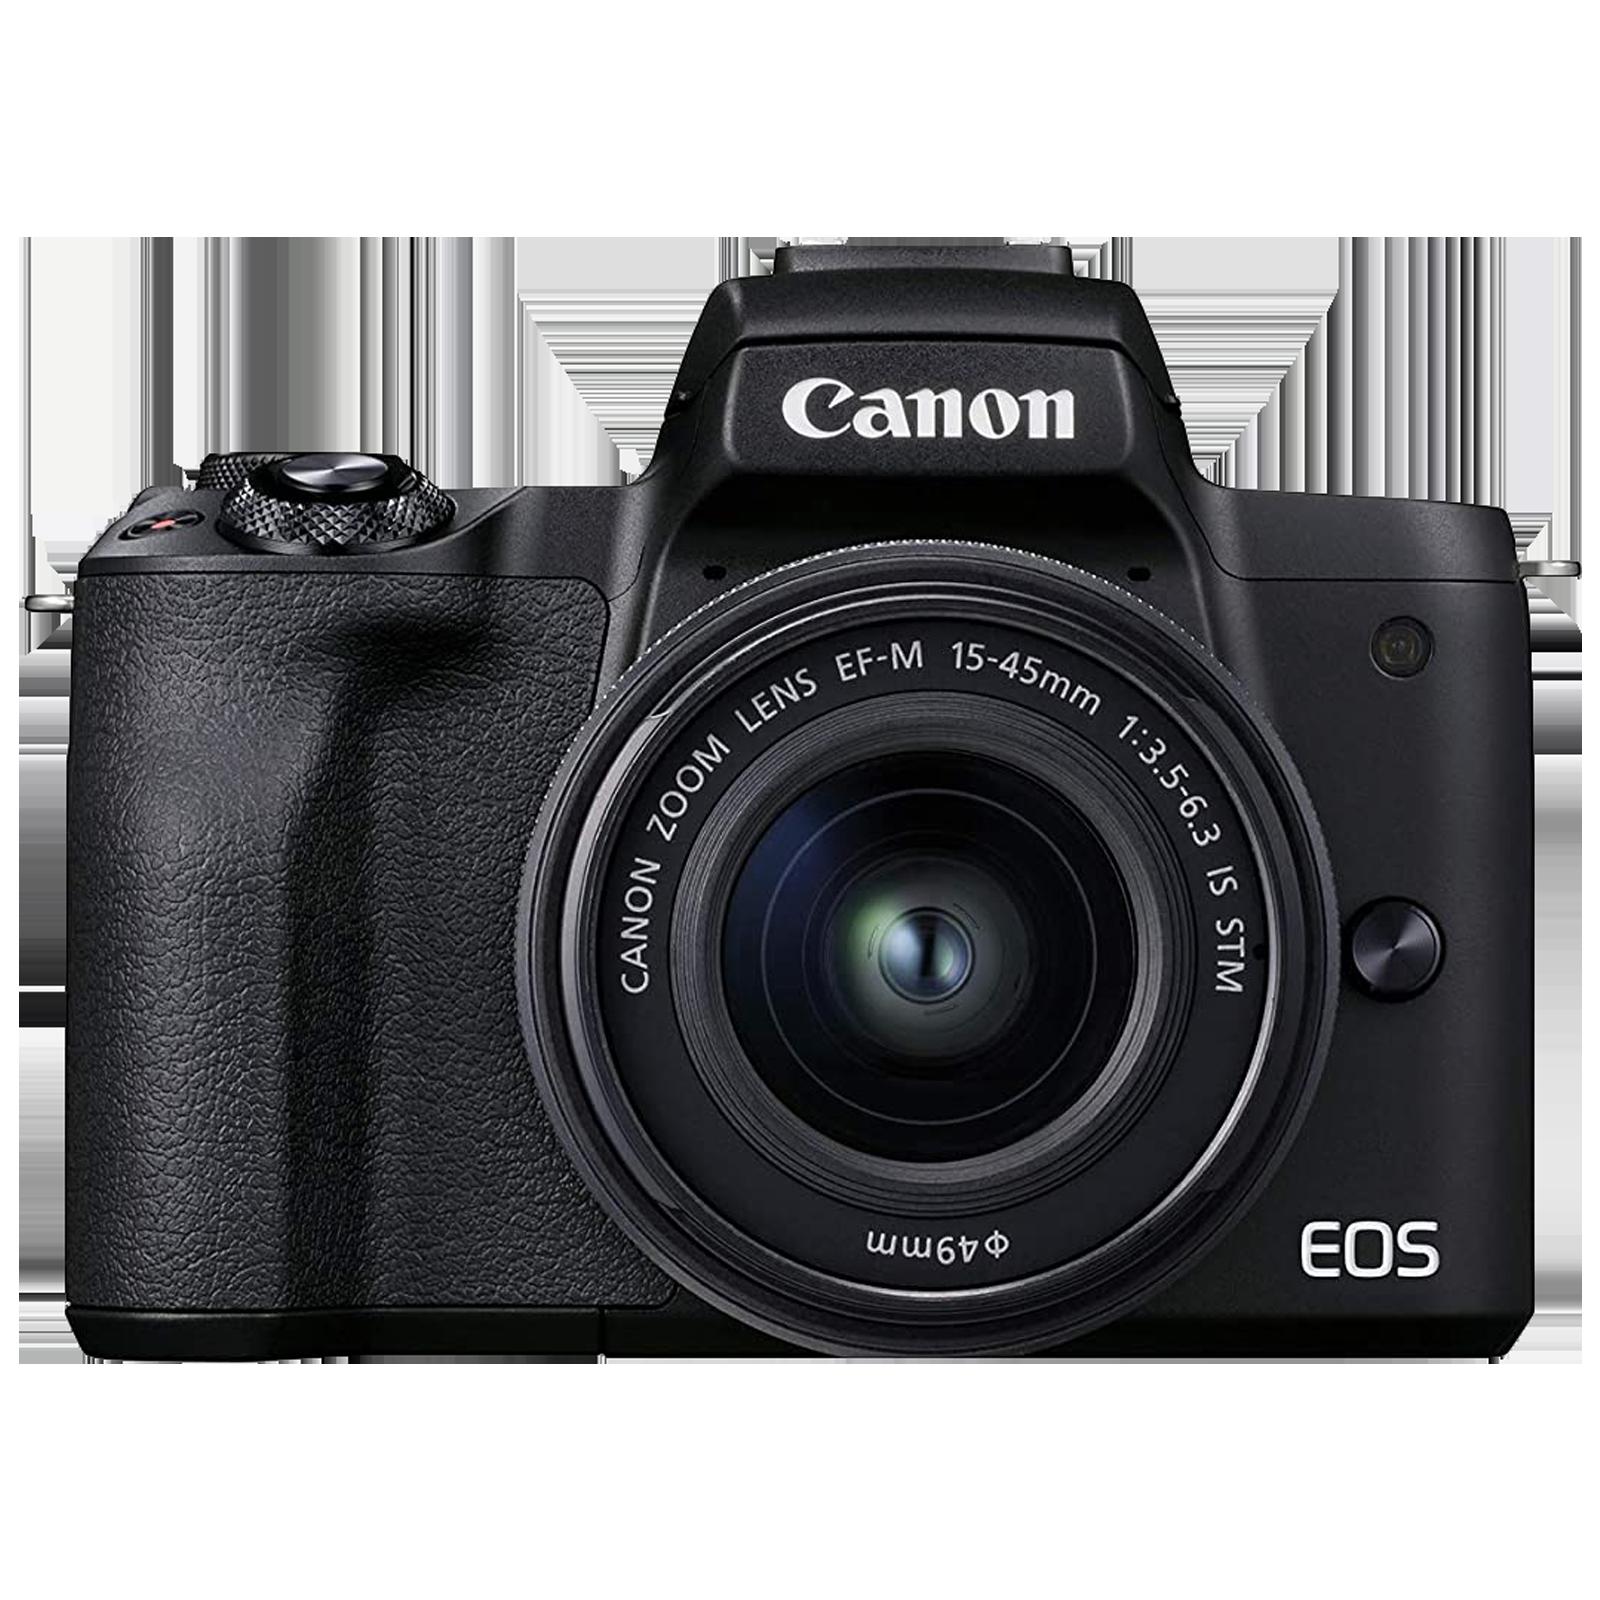 Canon EOS M50 Mark II 24.1MP DSLR Camera (EF-M15-45mm f/3.5-6.3 IS STM Single Lens Kit, Digic 8 Processor, Black)_1